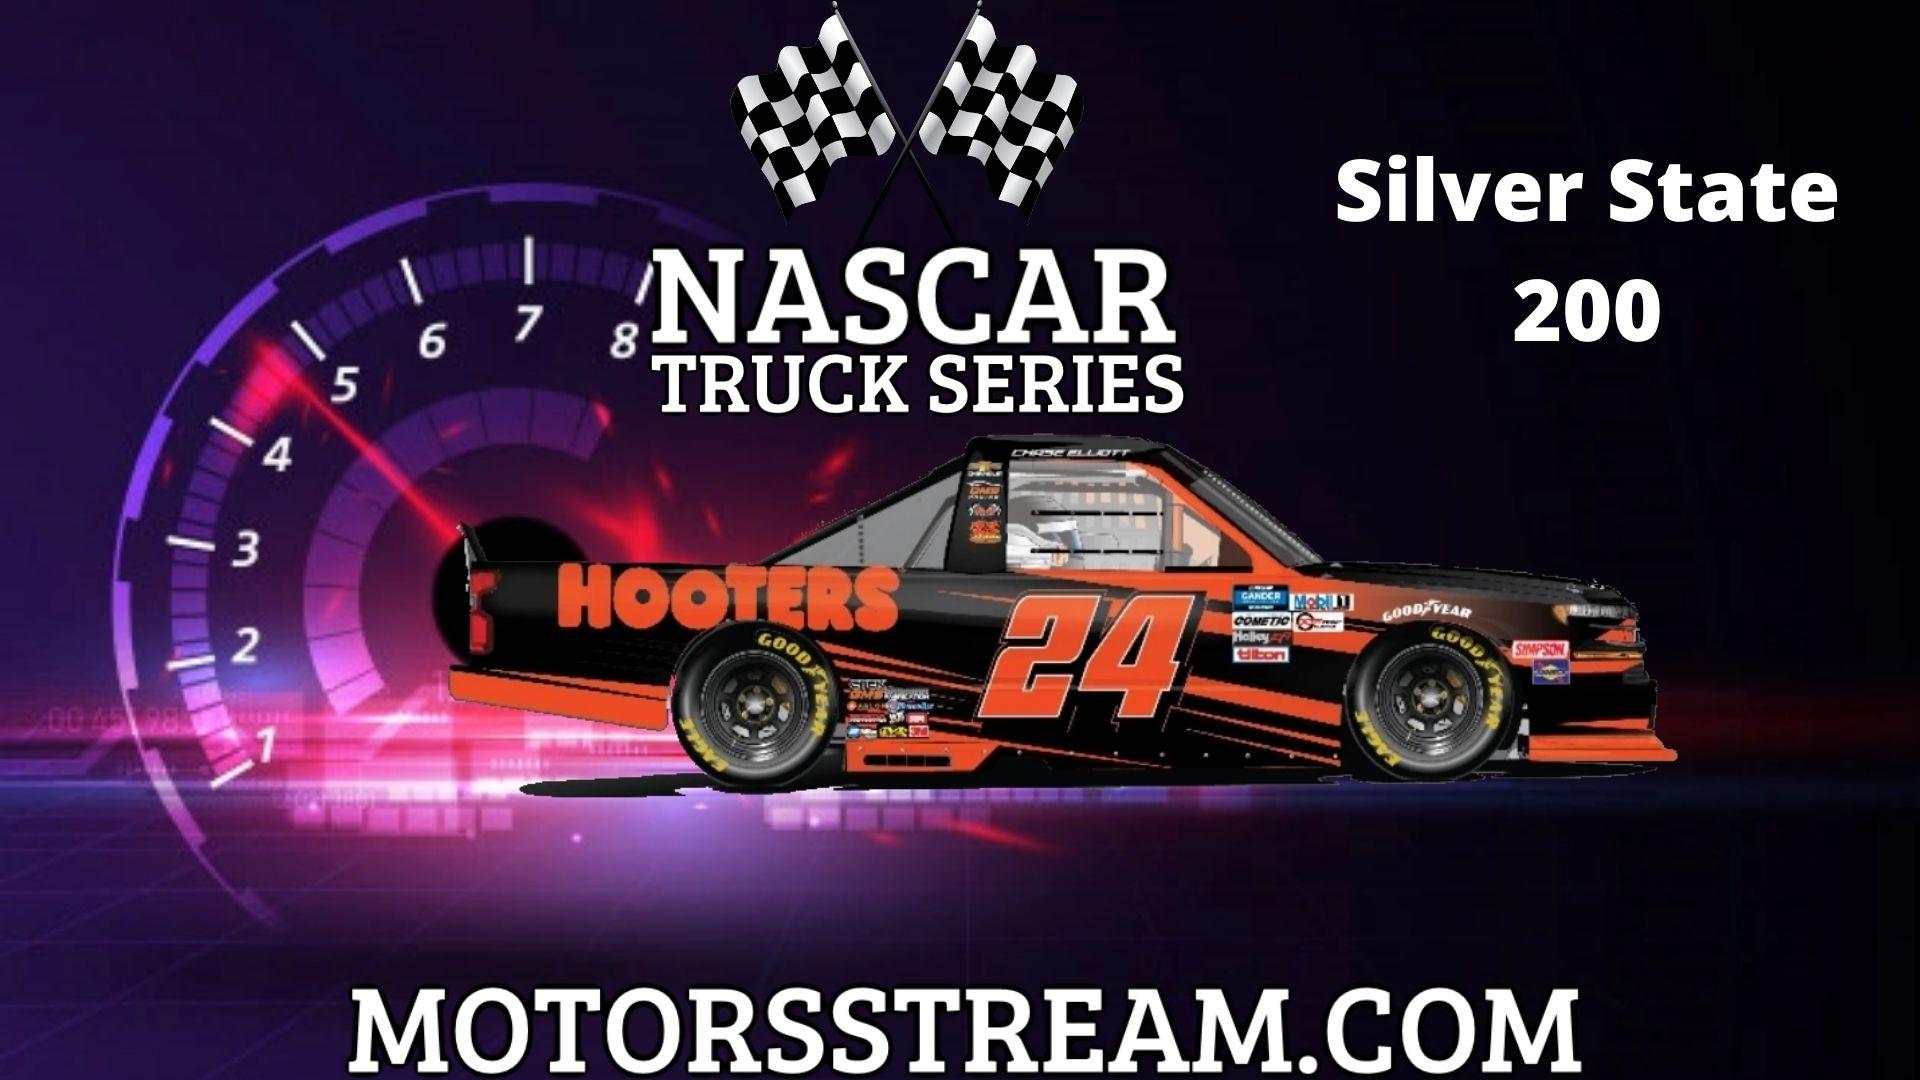 Silver State 200 Live Stream | NASCAR Truck 2021